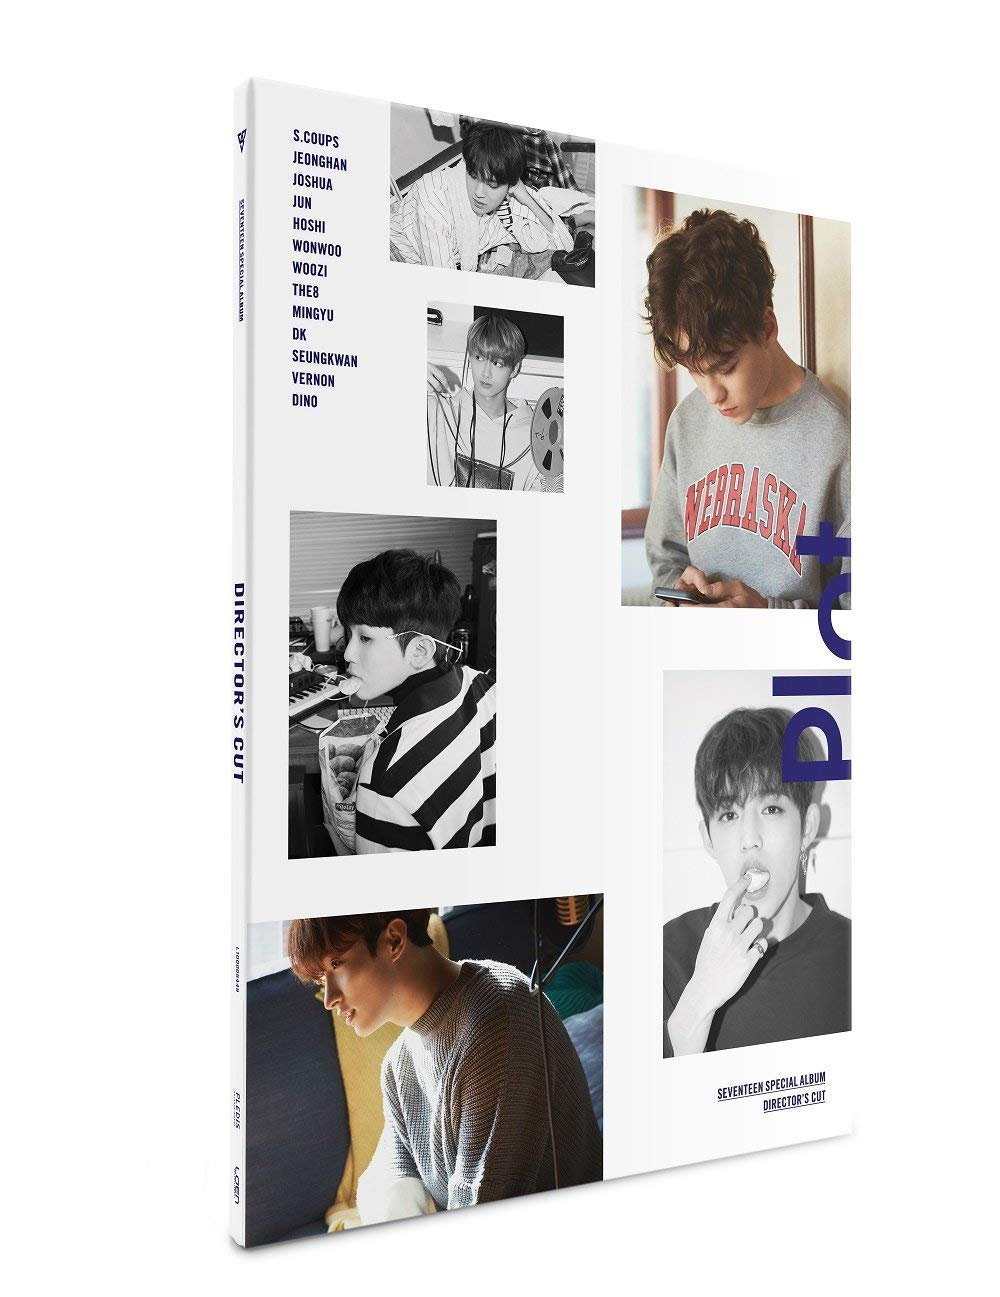 10 SEVENTEEN 5th Mini Album YOU MAKE MY DAY Mingyu Type-5 Photo Card K-POP